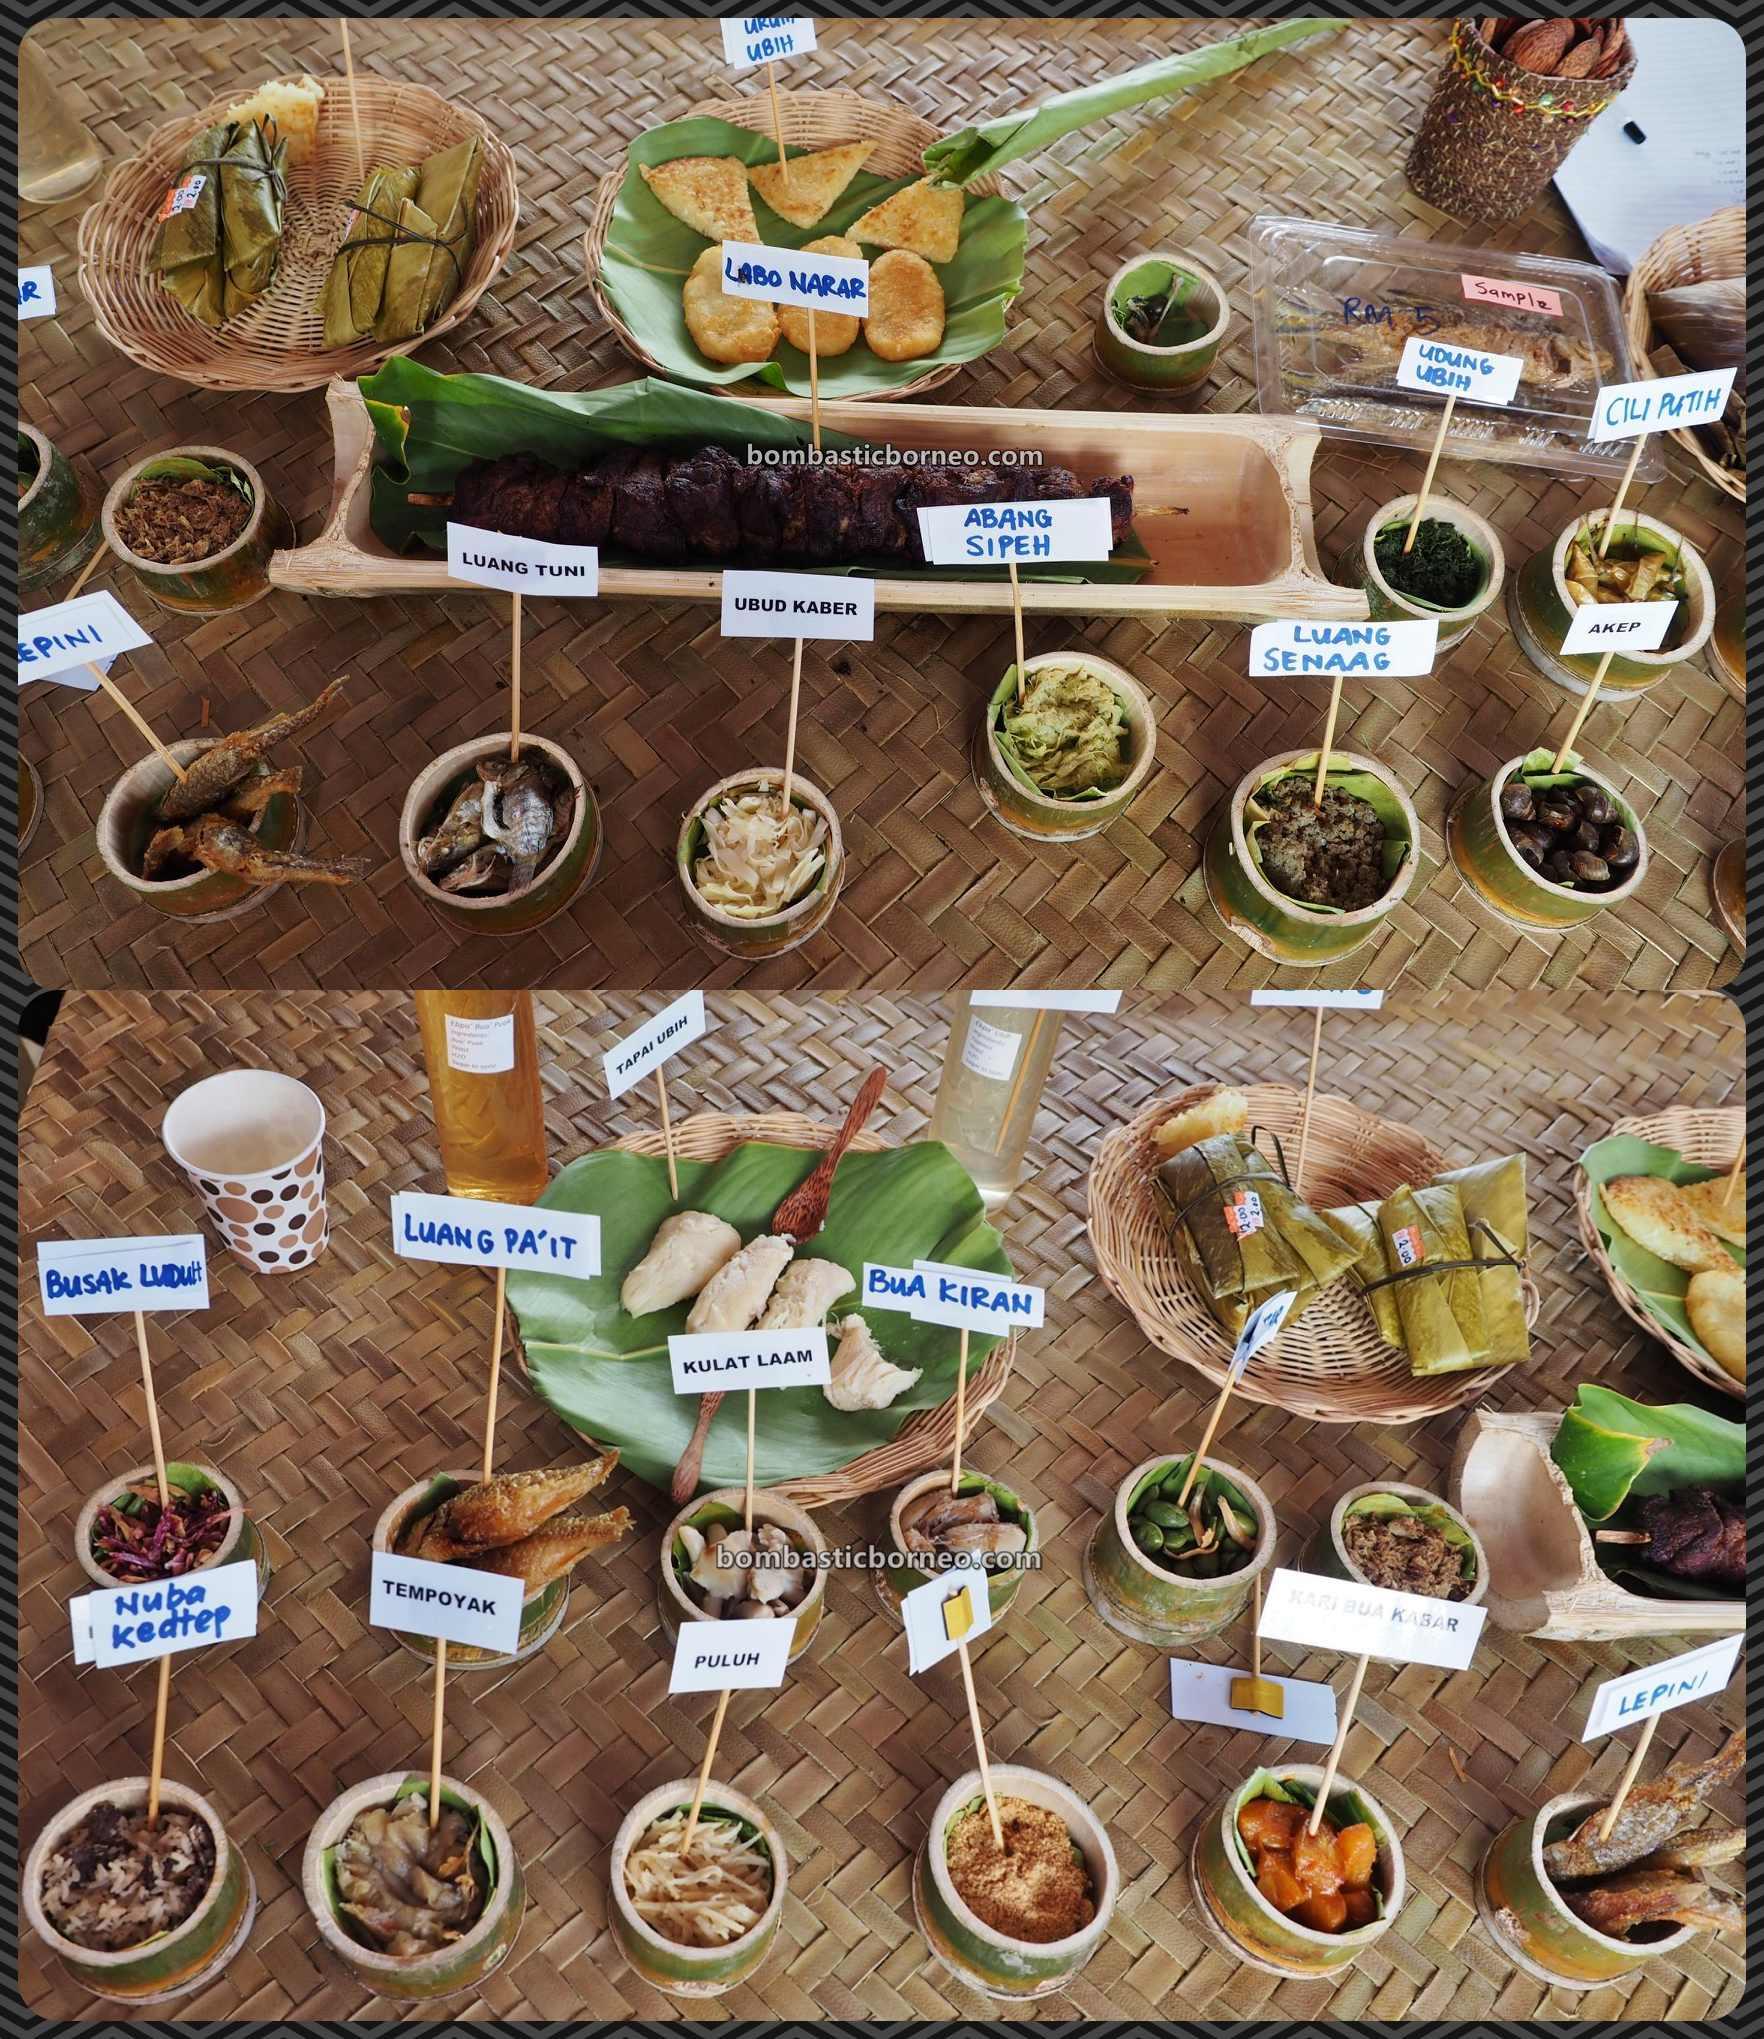 Pesta Nukenen, exotic culinary, authentic, traditional, dayak, native, Orang Ulu, tribal, Kelabit Highlands, Malaysia, travel guide, Trans Borneo, 穿越婆罗洲内陆高原, 马来西亚砂拉越巴里奥, 加拉毕族传统达雅美食